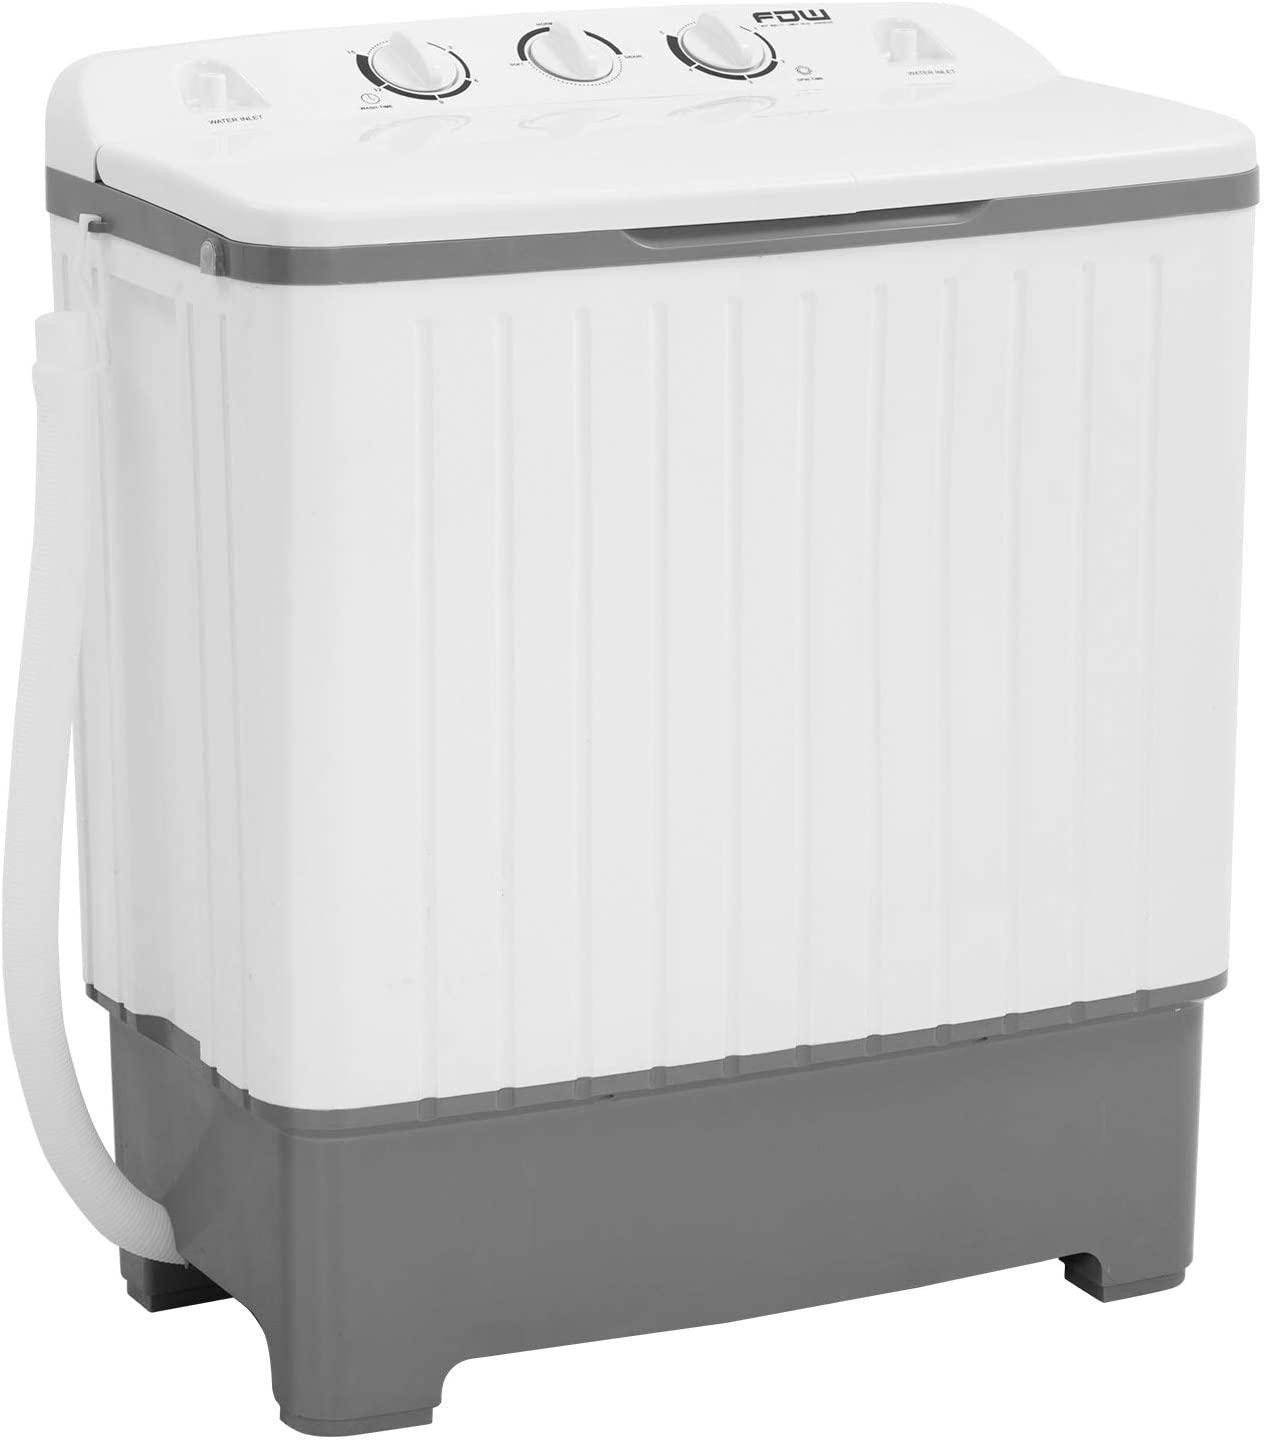 FDW Portable Washing Machine